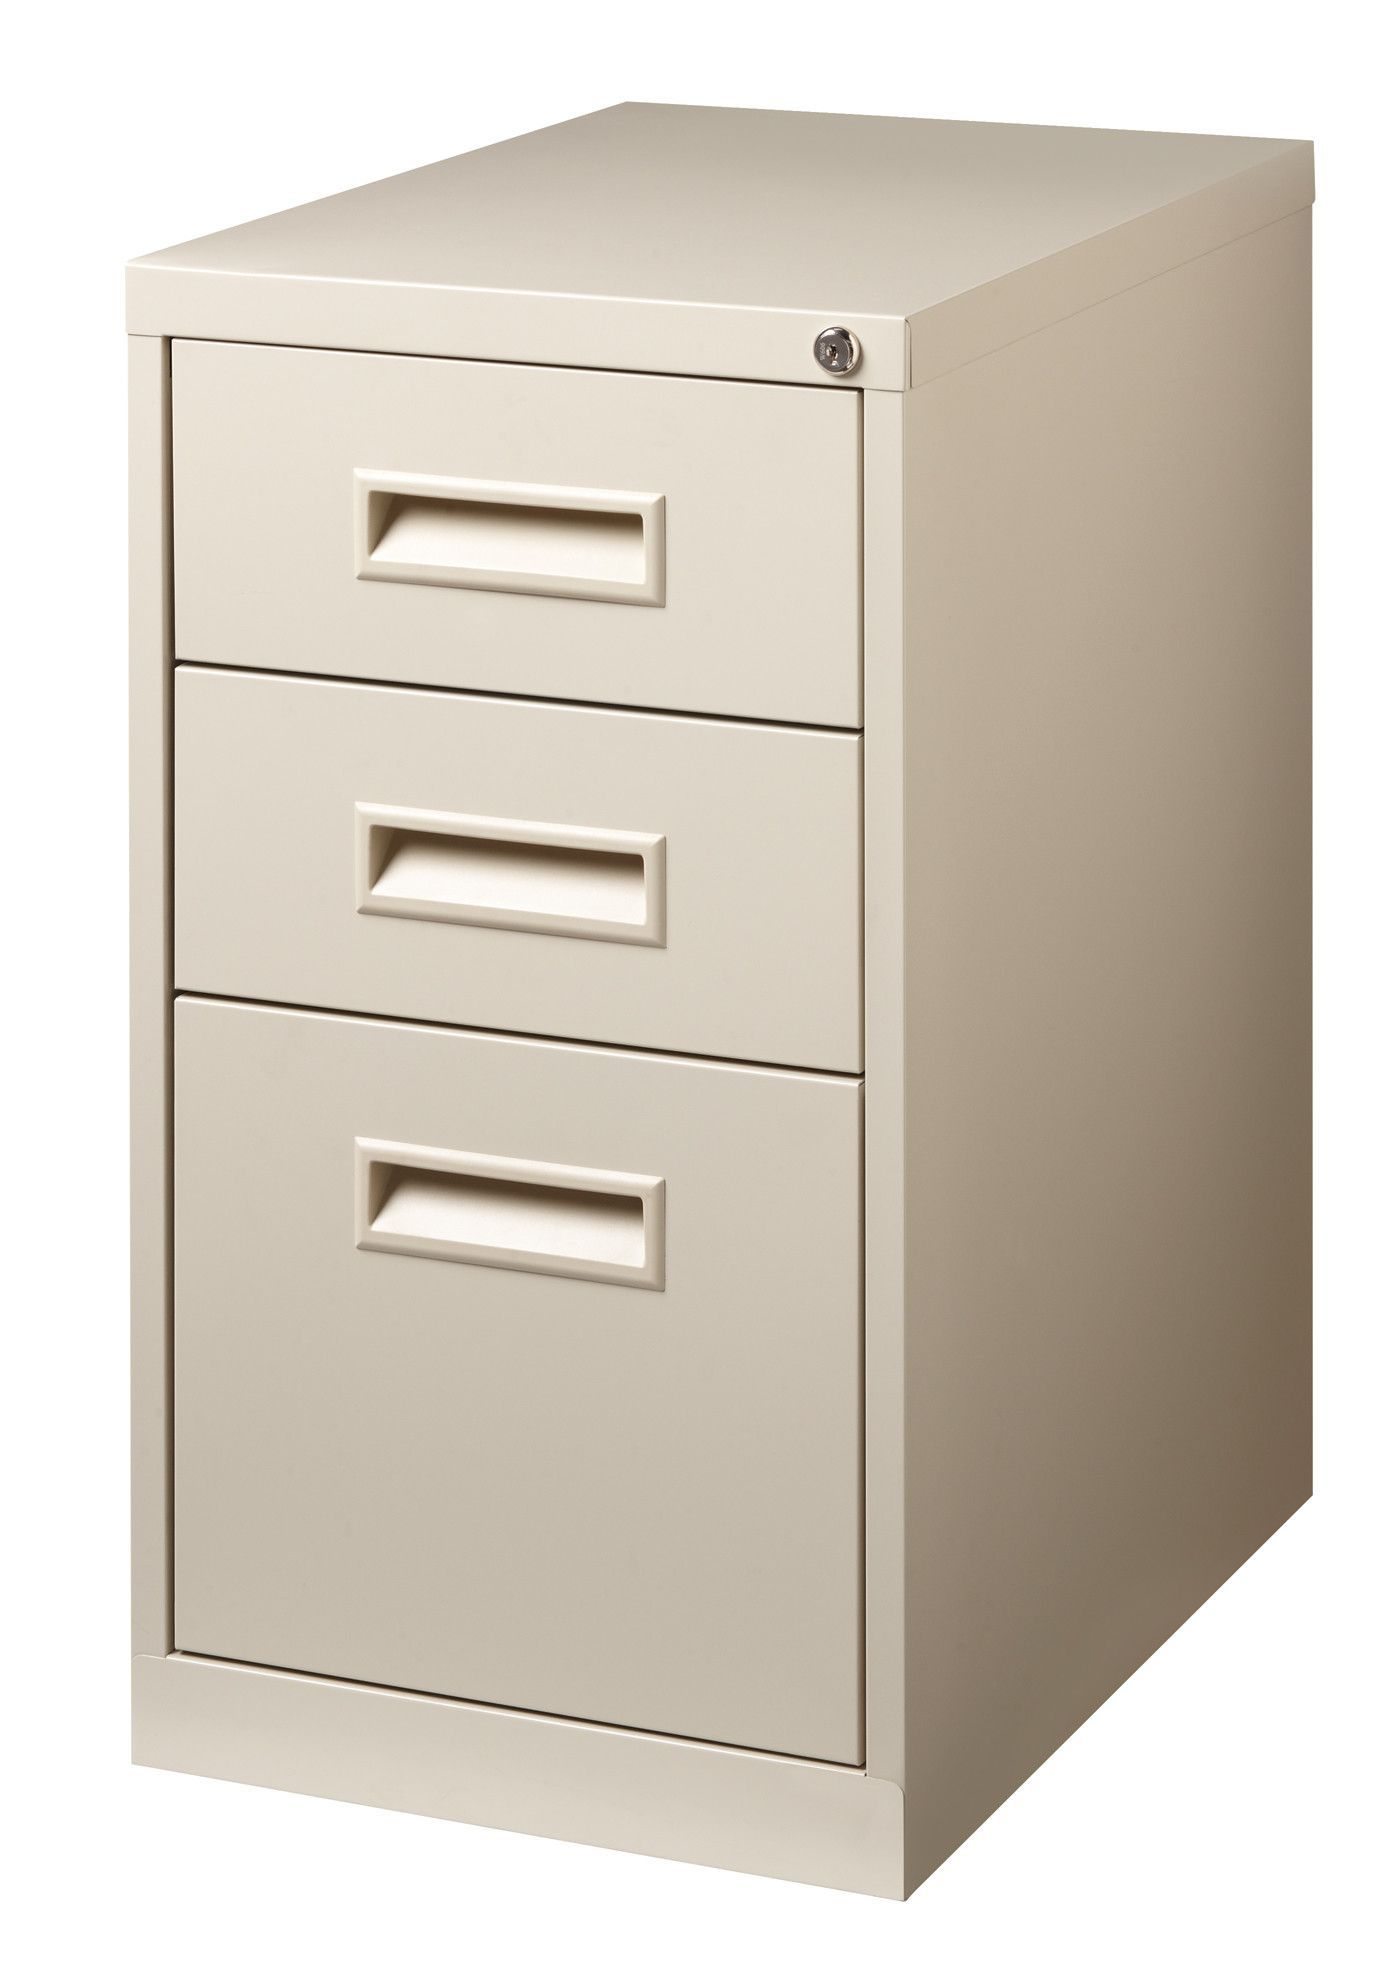 3 Drawer Mobile Vertical Filing Cabinet